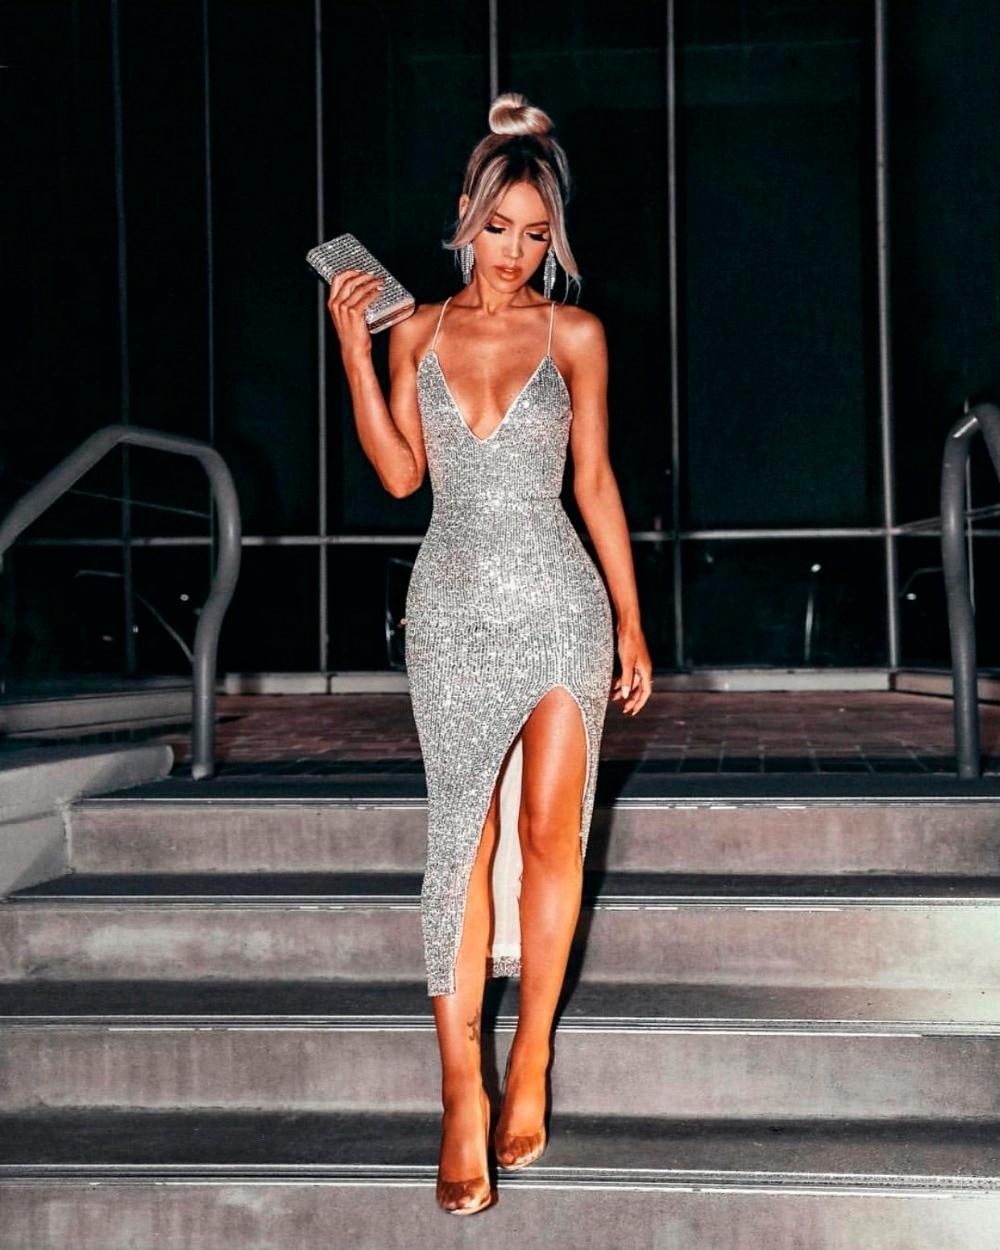 Vestidos Women Sexy Sequins Bling Silver Party Dress 2019 -8512